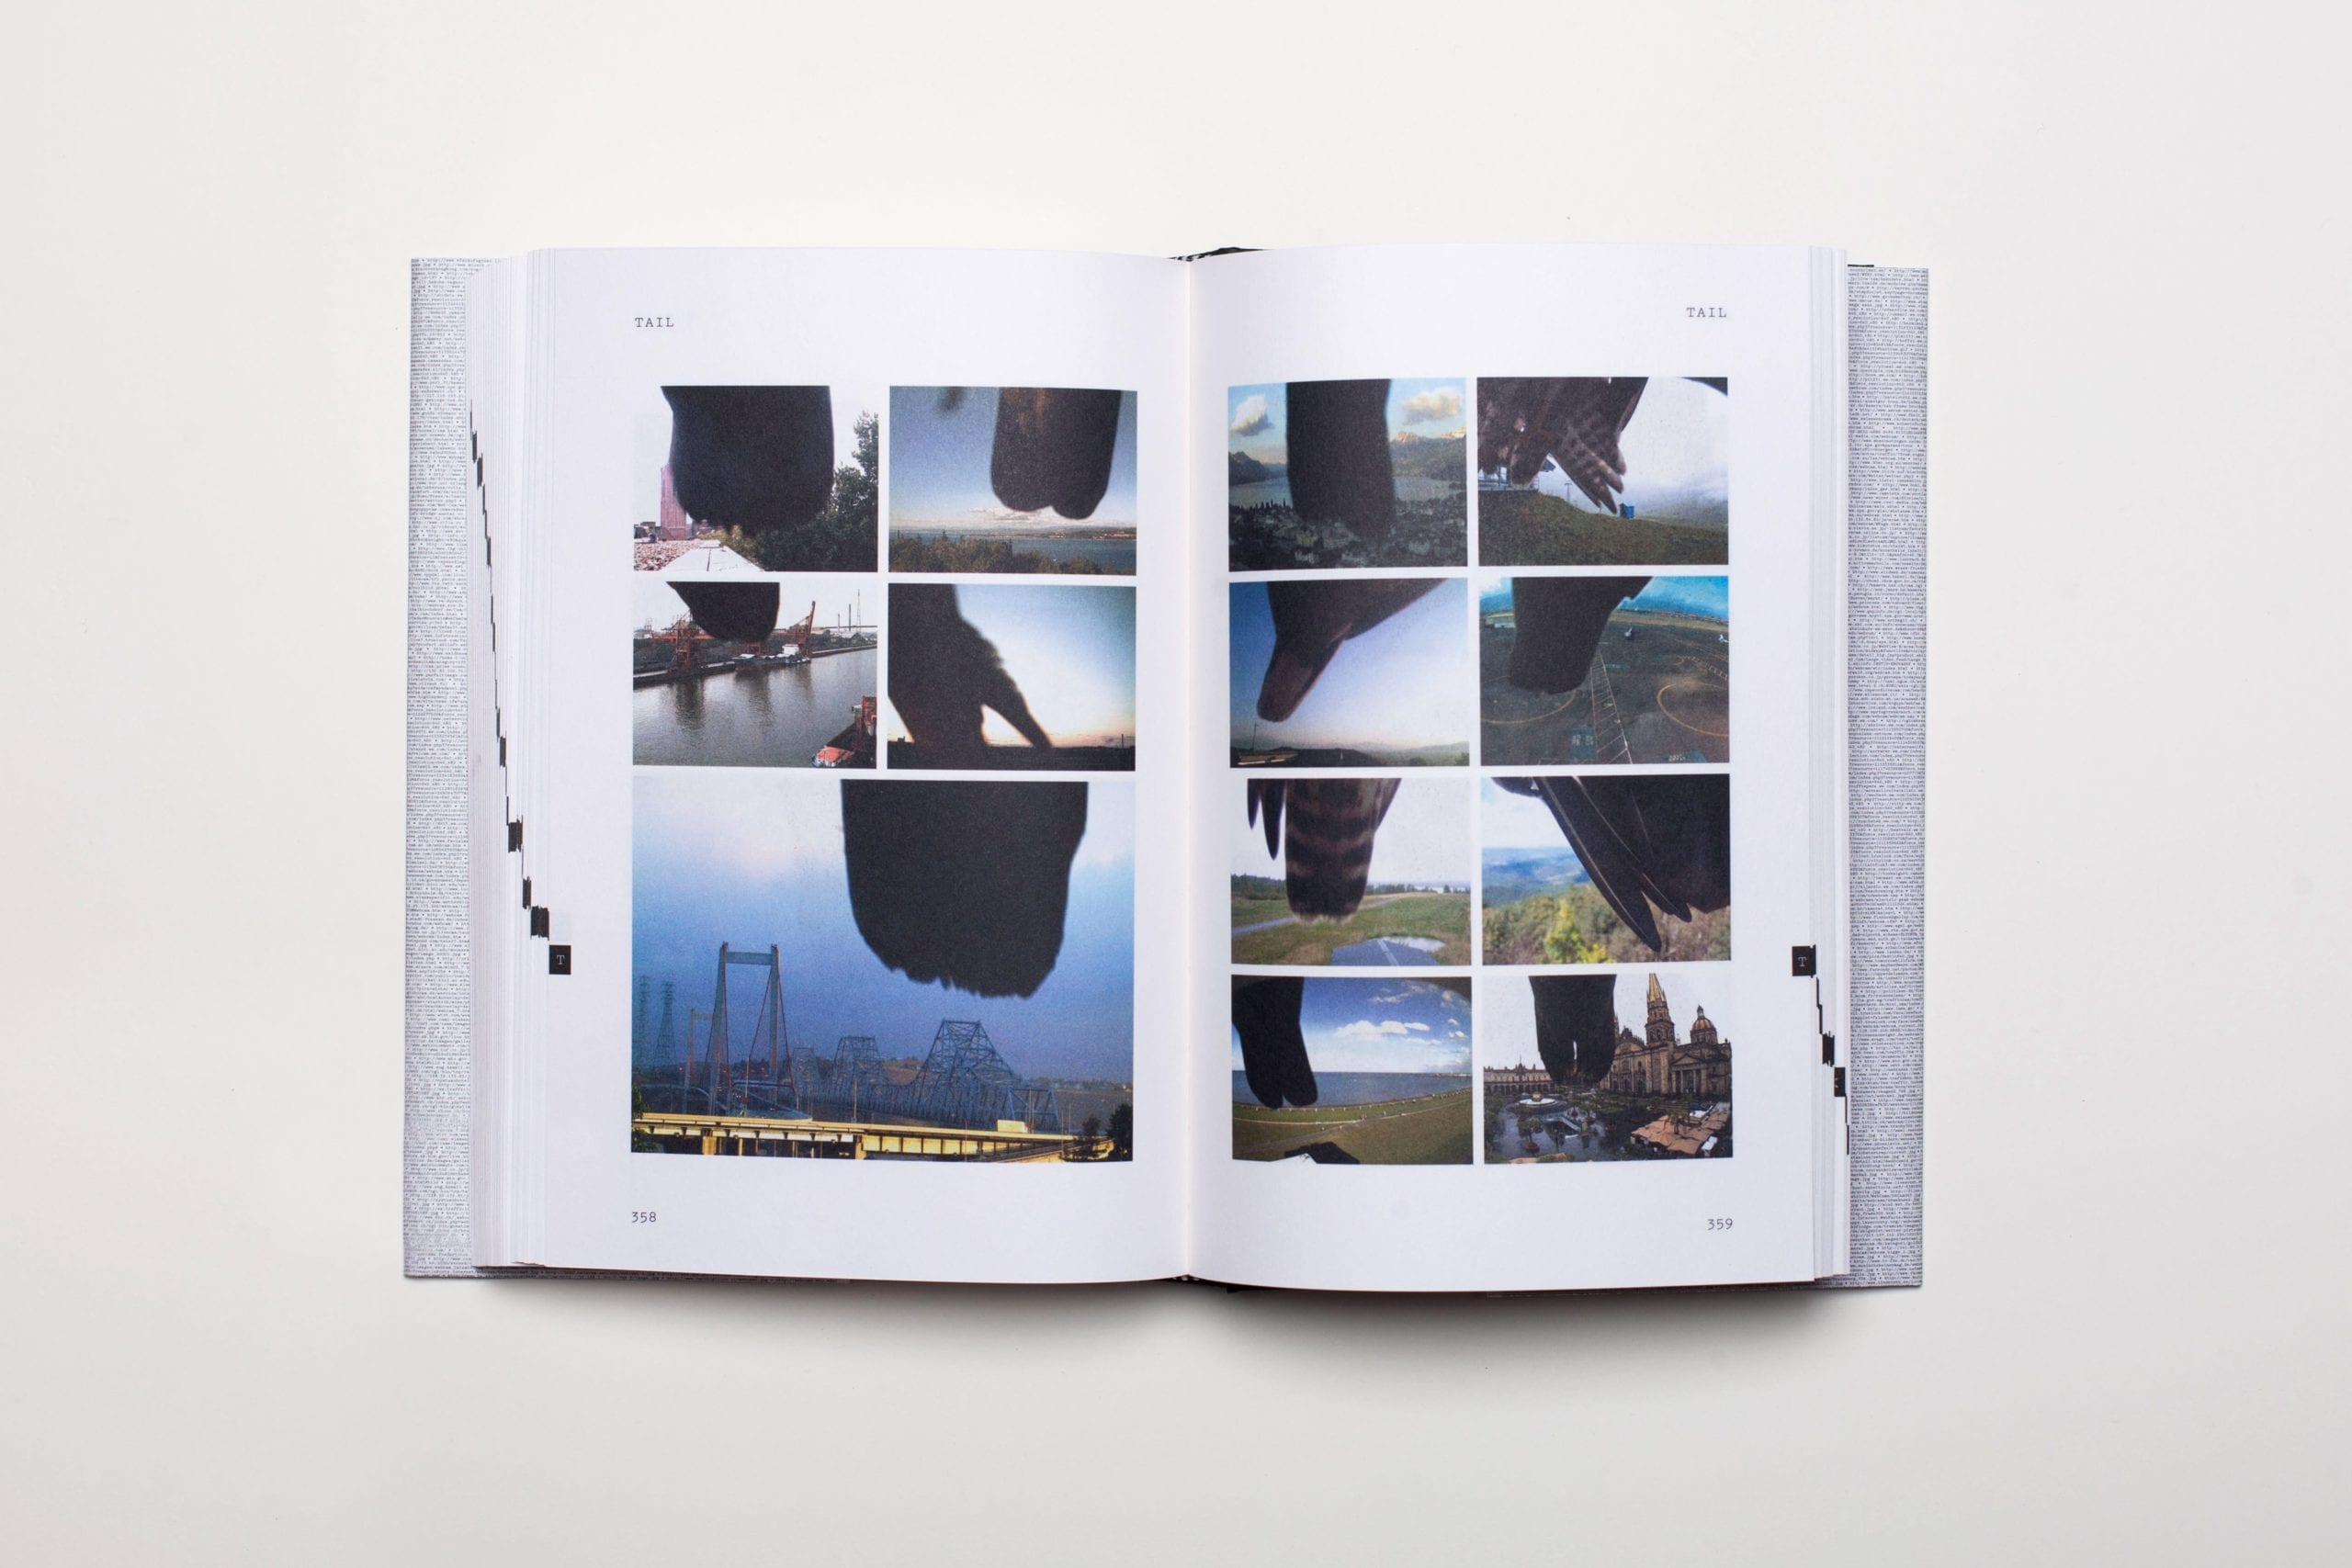 The Encylclopedia of Kurt Caviezel